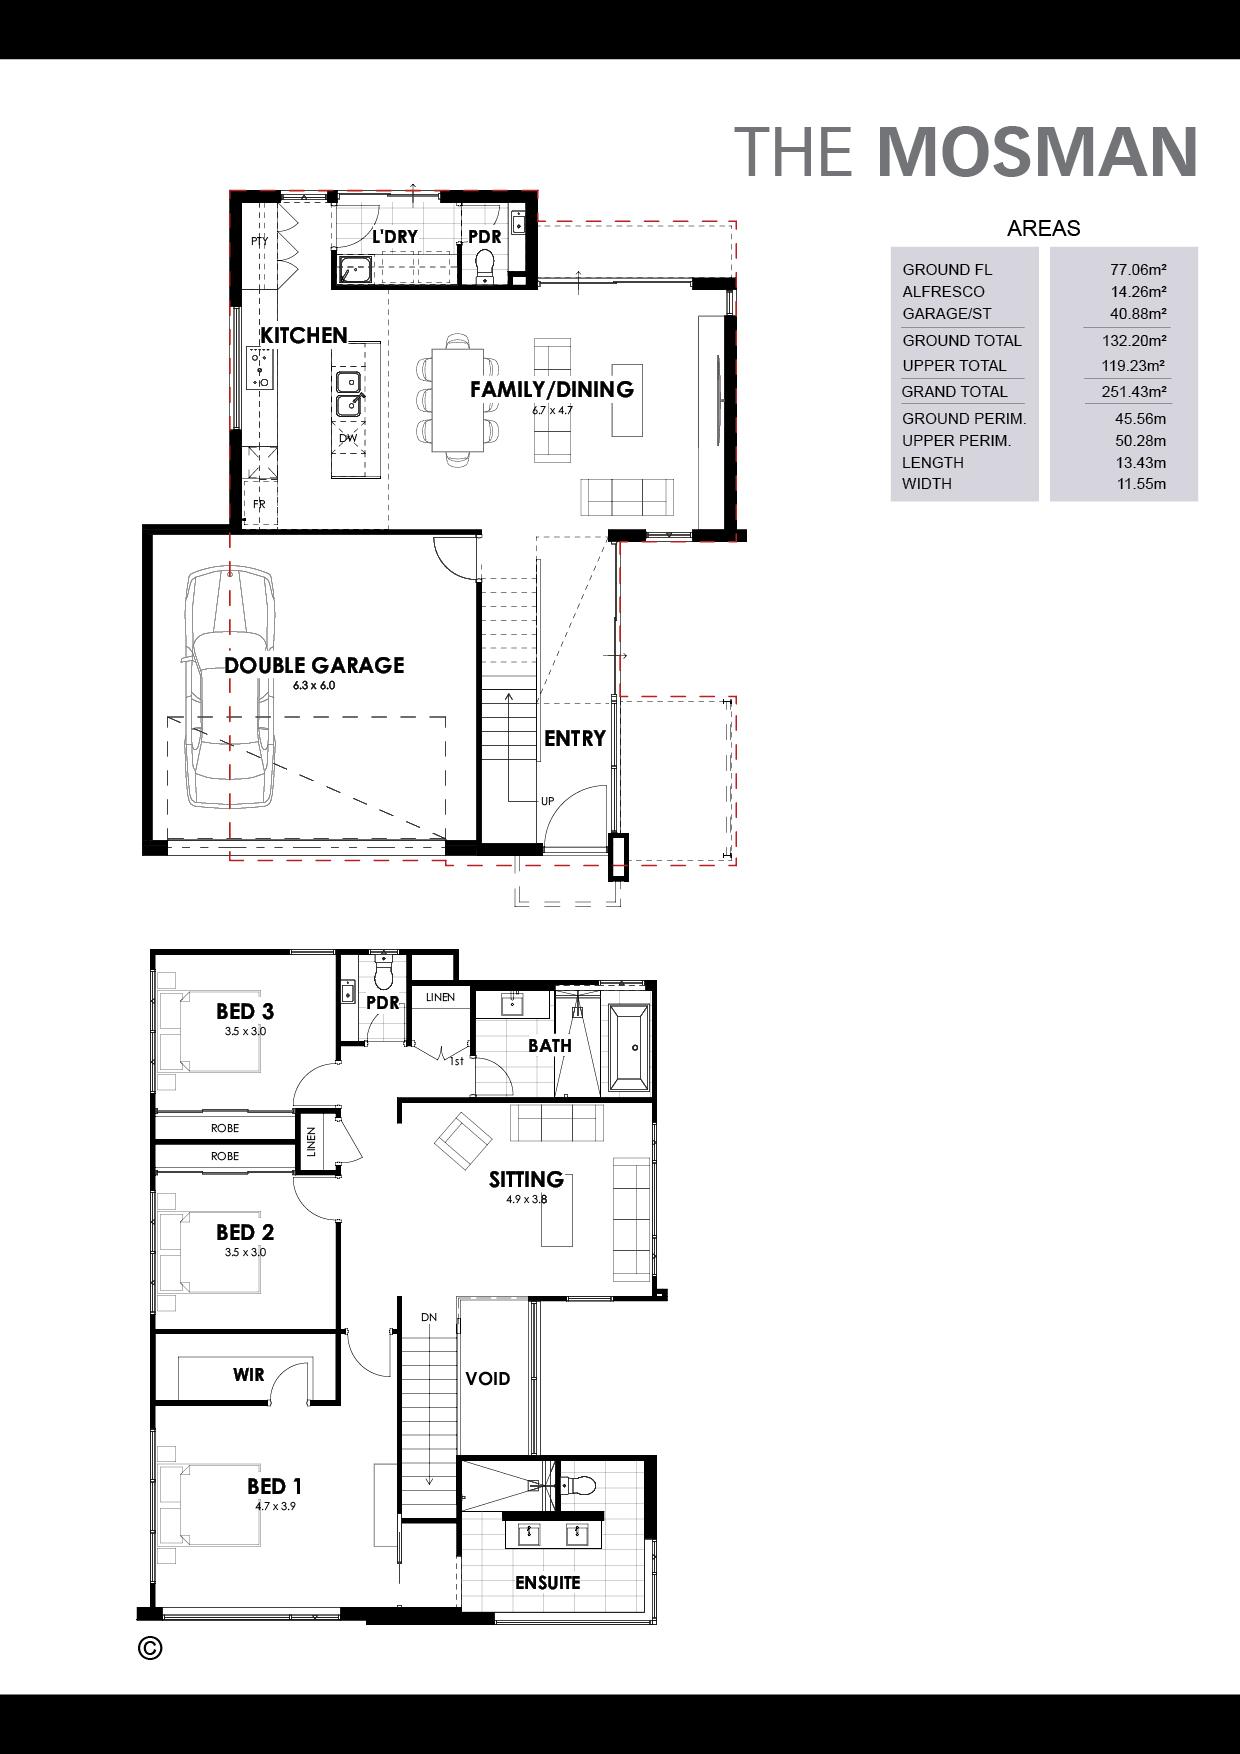 The Mosman Floorplan